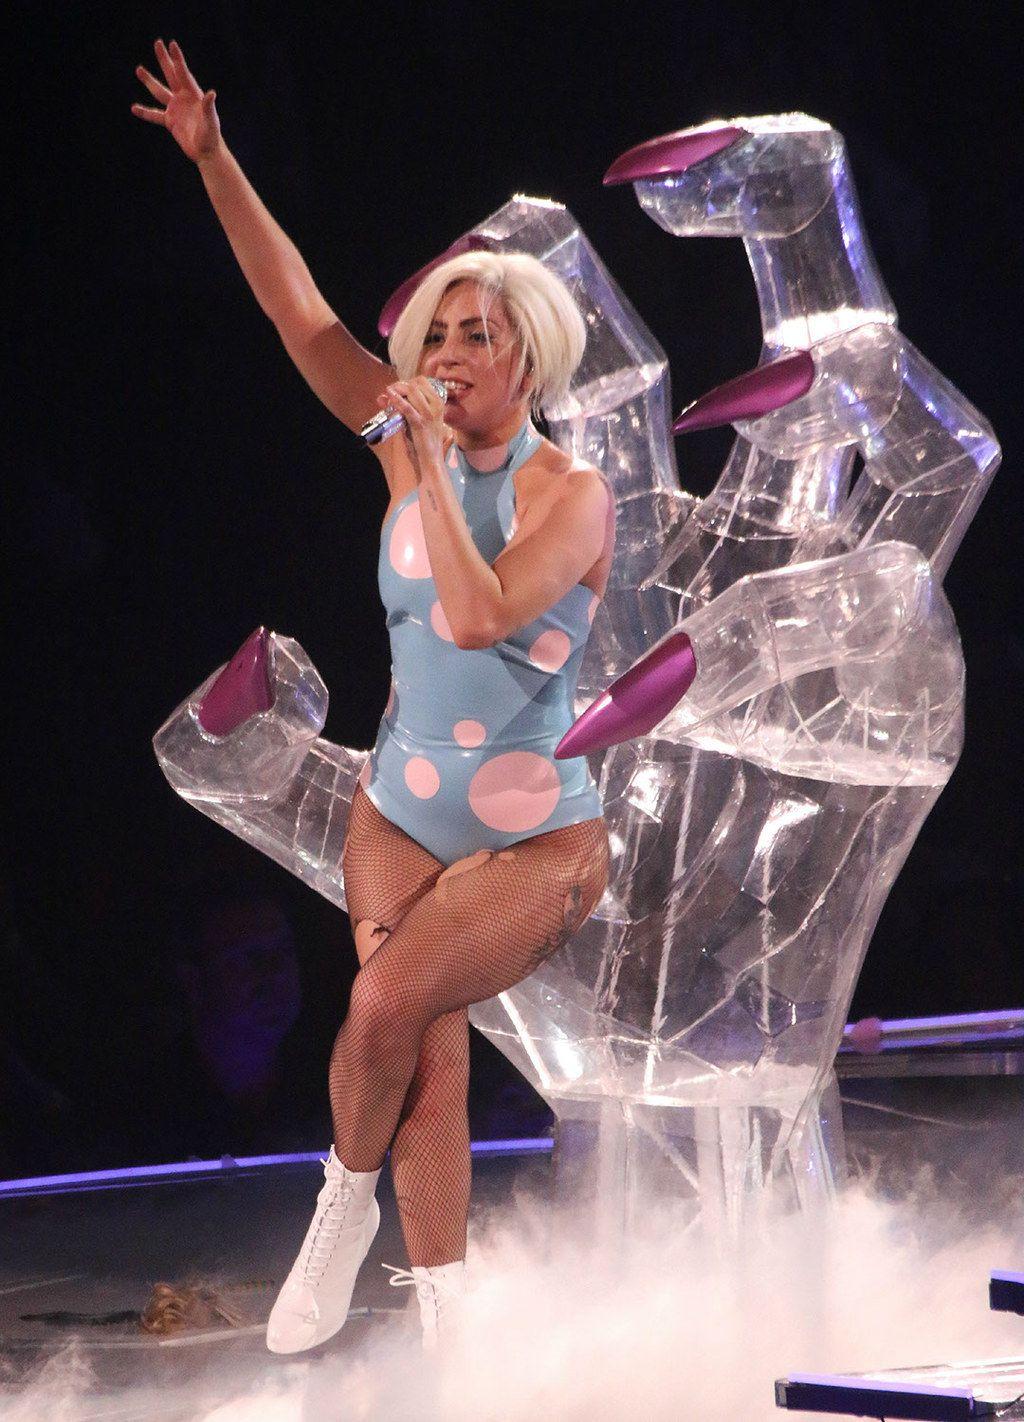 Here S What Lady Gaga Is Wearing During Her Artpop Ball Tour Lady Gaga Costume Lady Gaga Fashion Lady Gaga Artpop